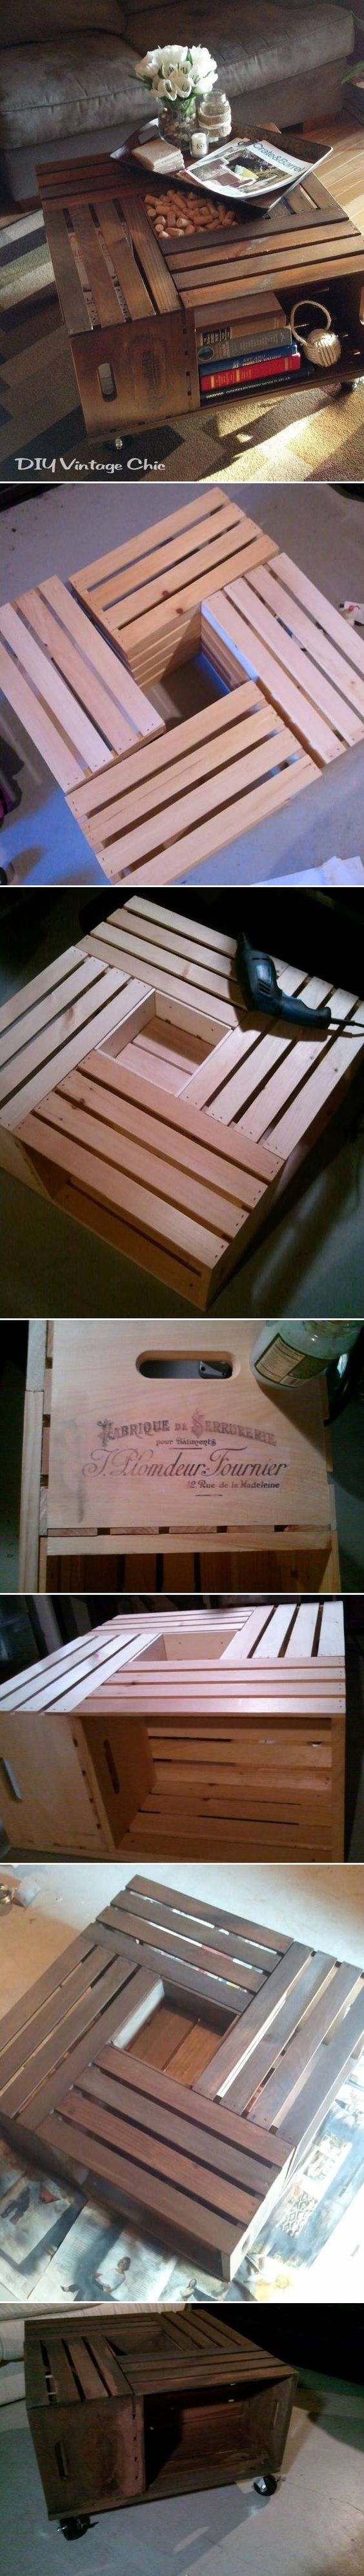 Diy primitive furniture - Best 25 Wooden Boxes Ideas On Pinterest Diy Wooden Box Planter Box Centerpiece And Decorative Wooden Boxes